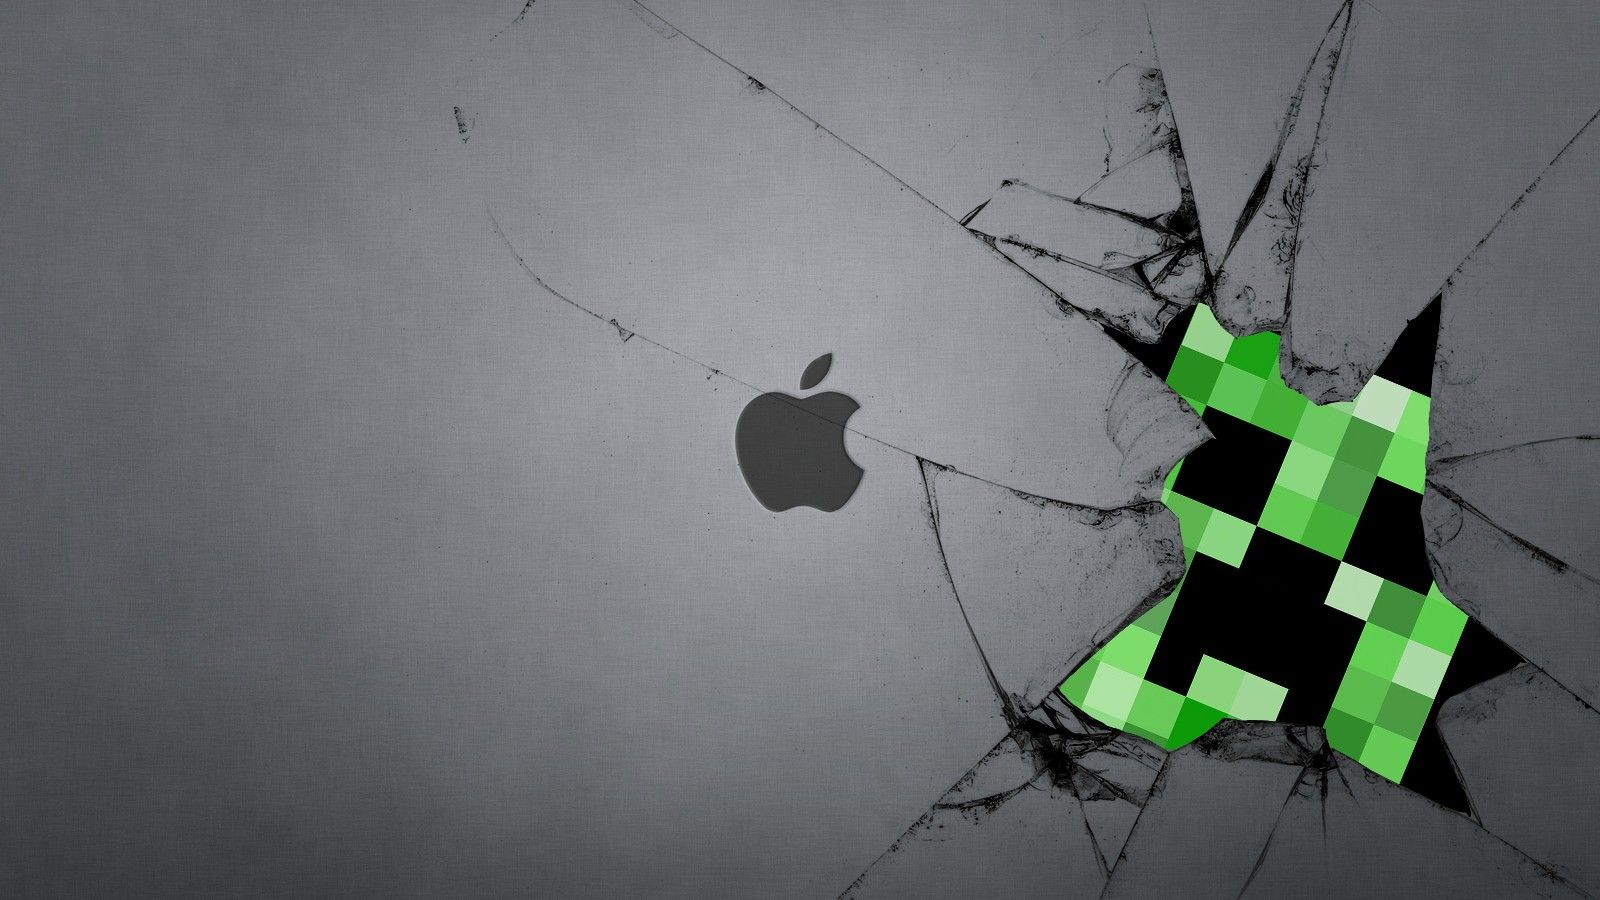 Minecraft wallpapers hd wallpapers pinterest minecraft minecraft wallpapers voltagebd Choice Image